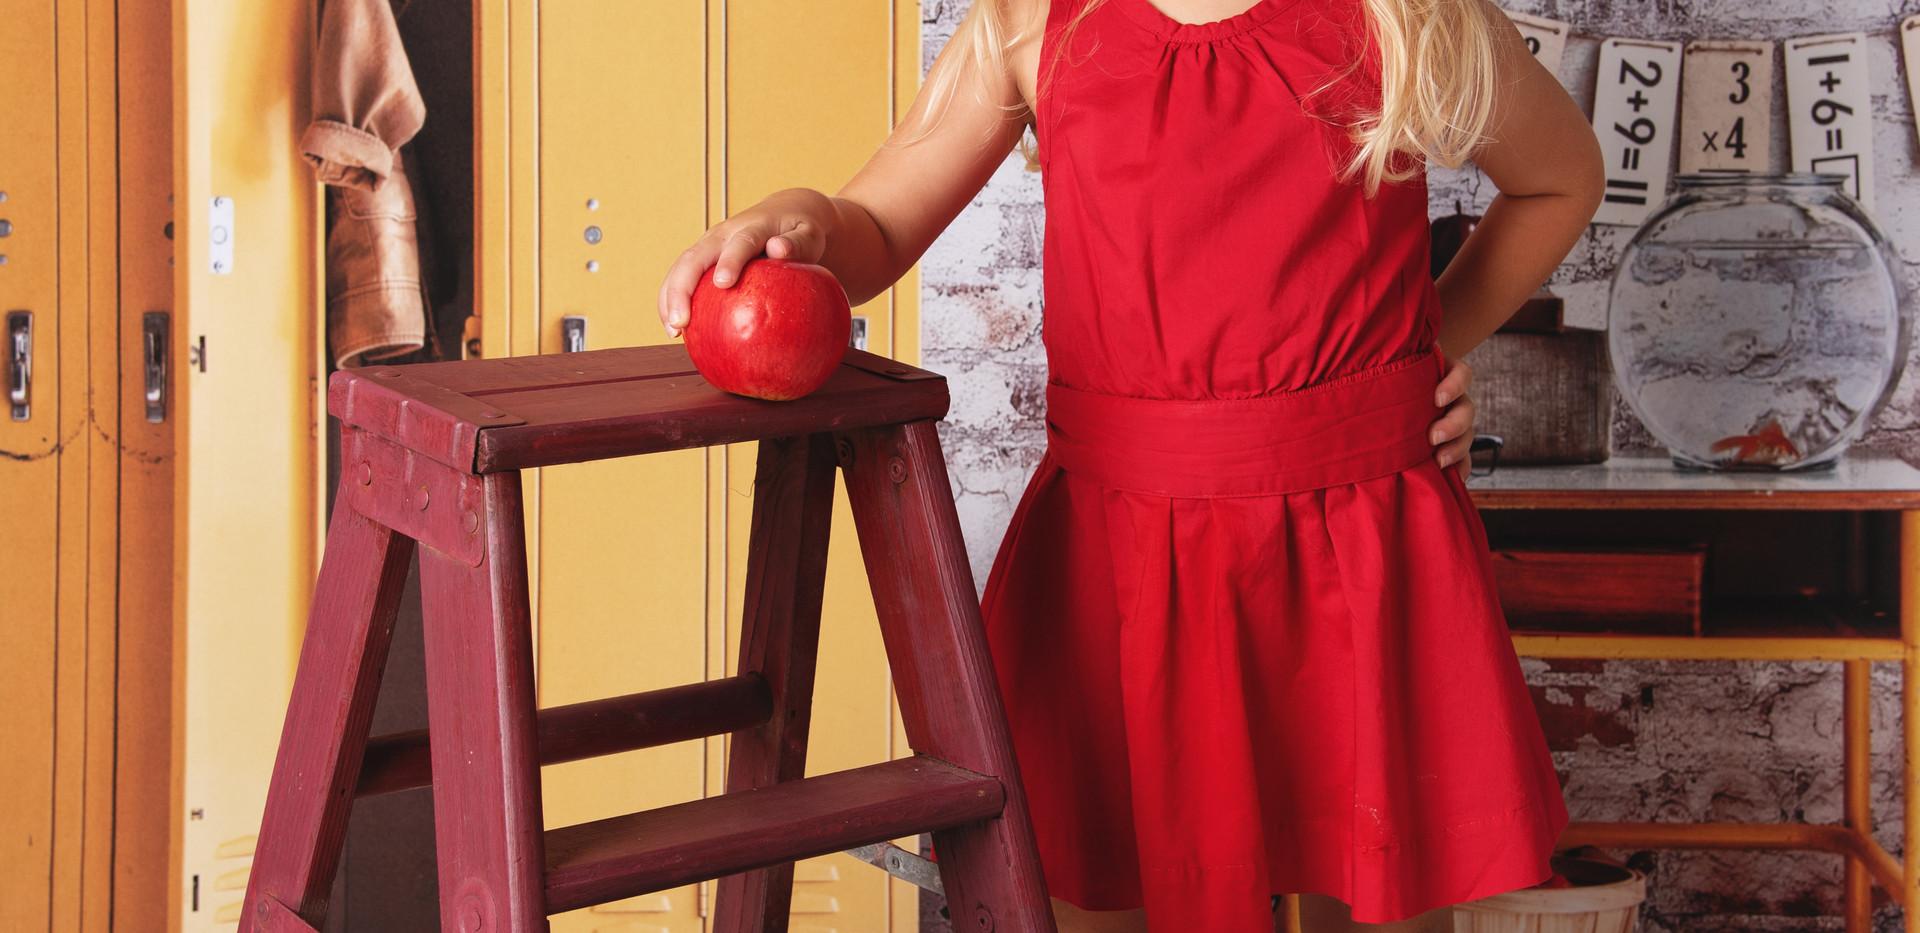 HooperGirlsBacktoSchool-19.jpg